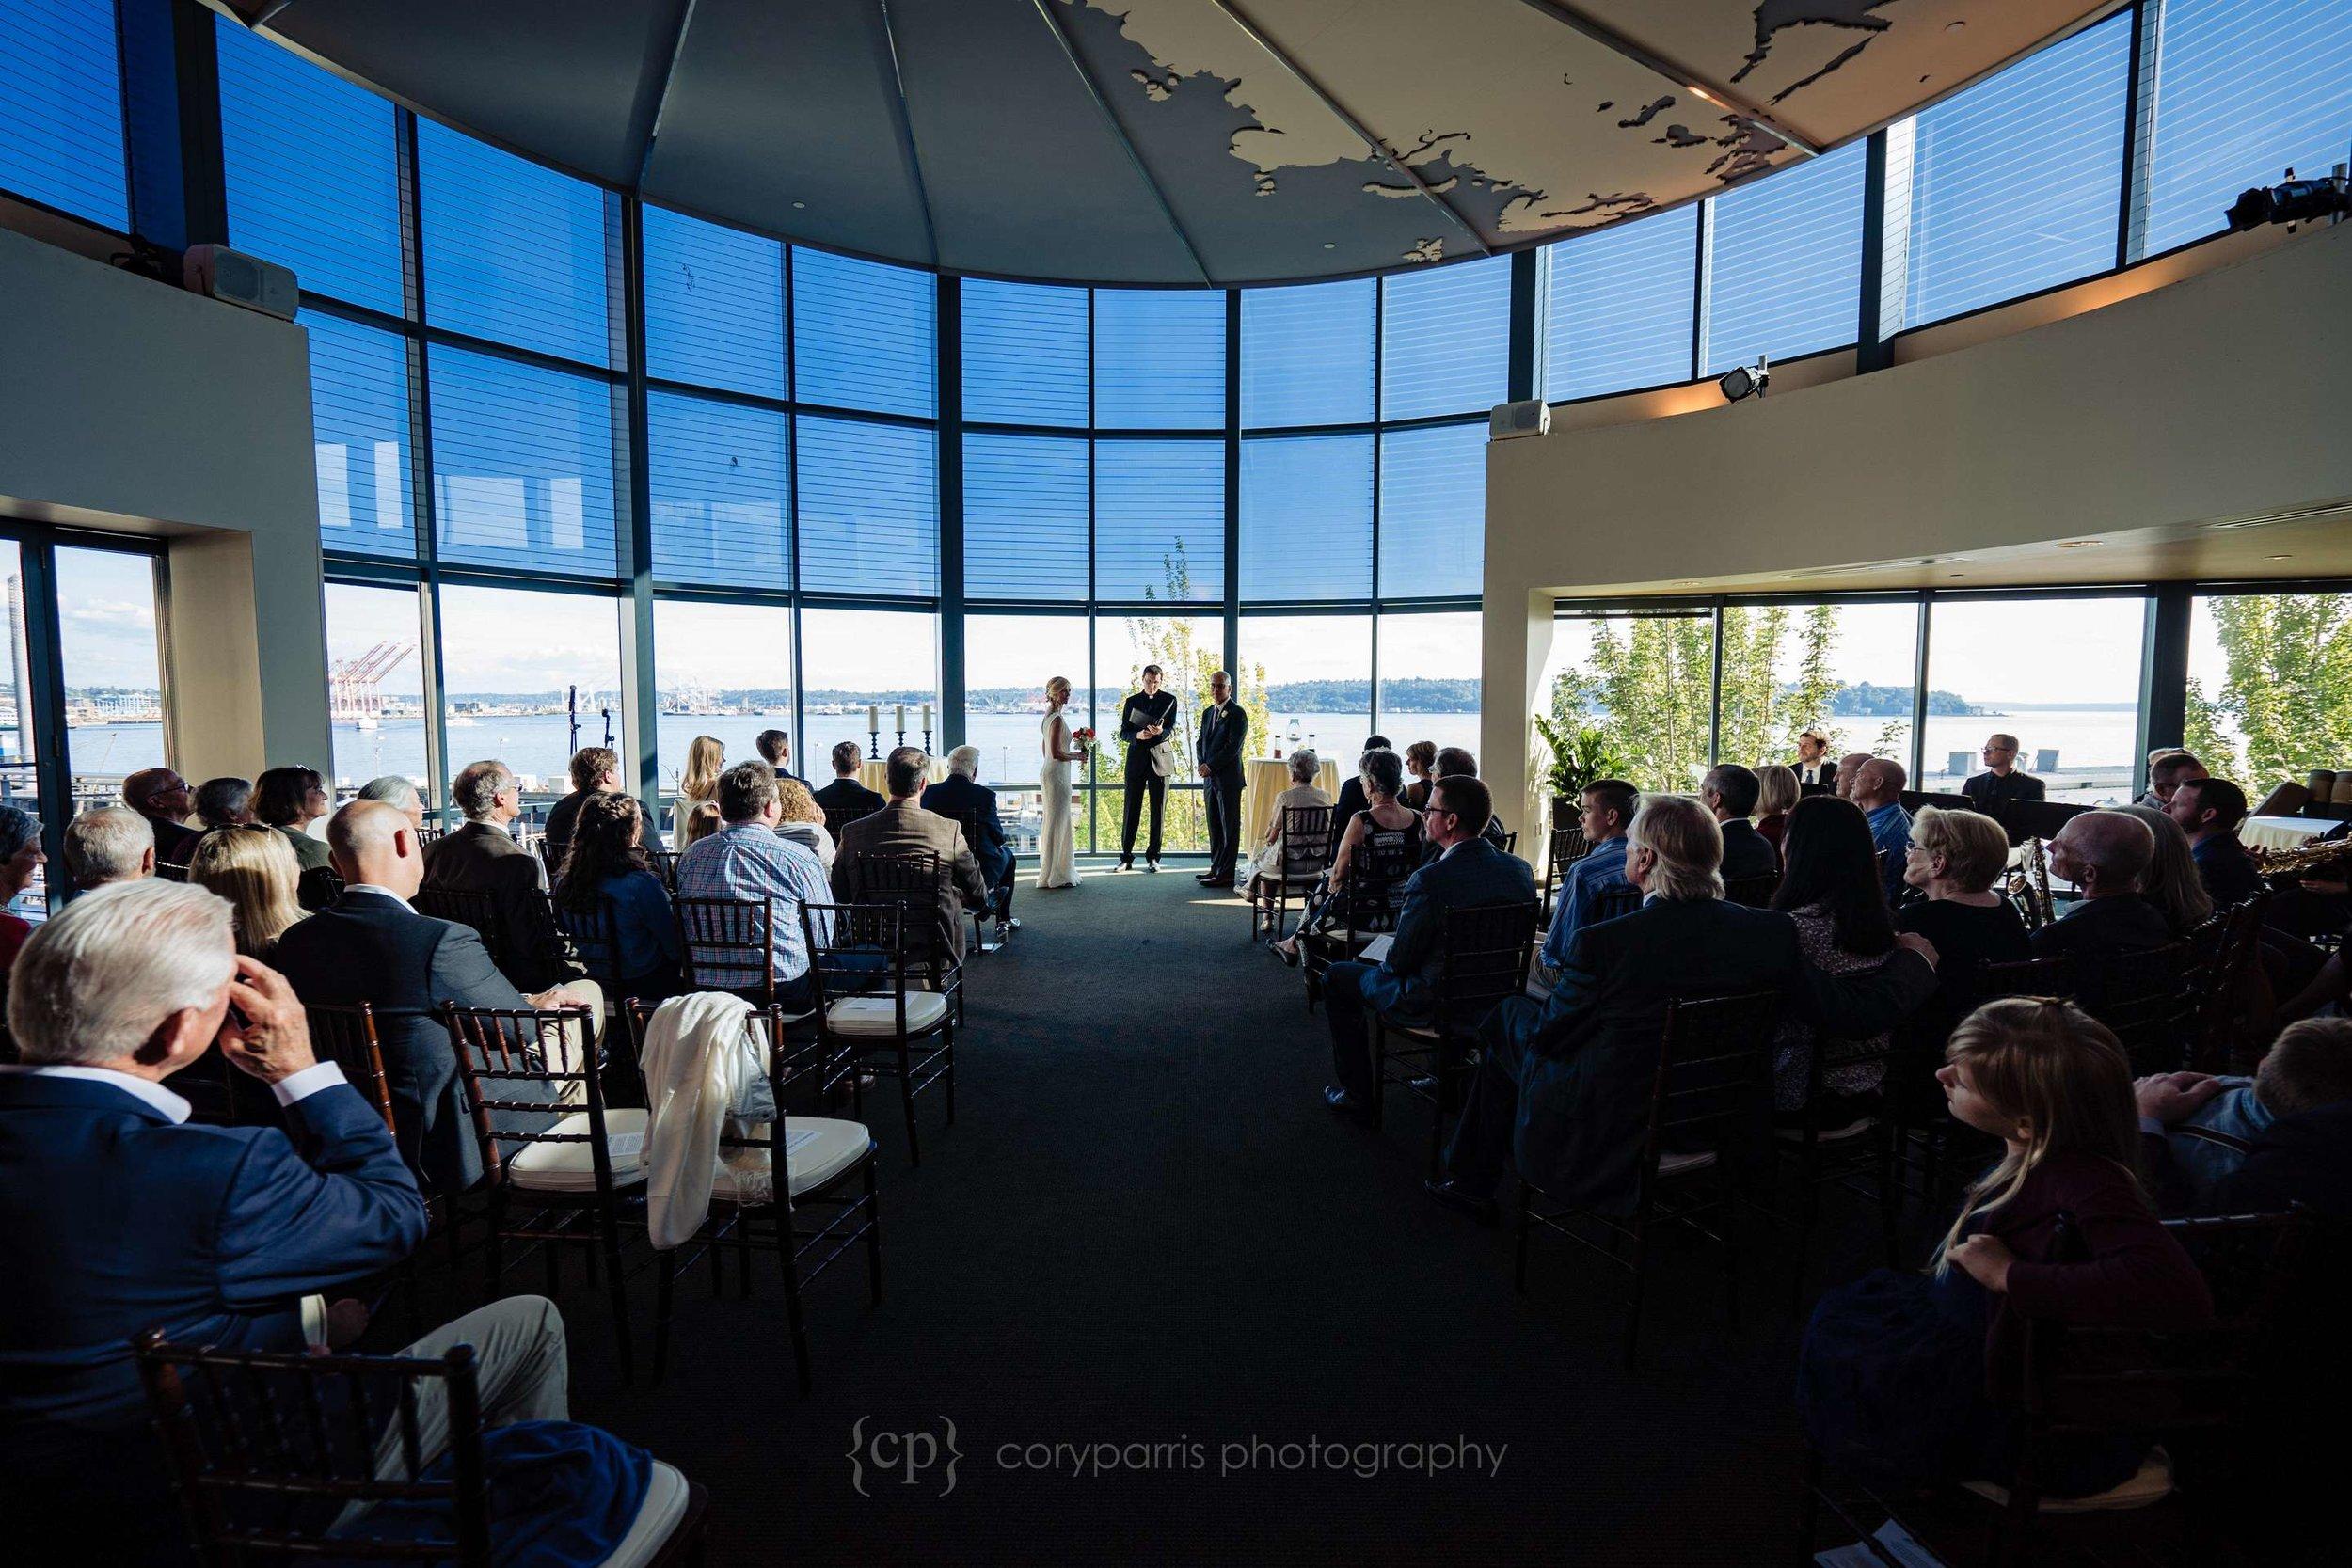 403-World-Trade-Center-Seattle-Wedding.jpg